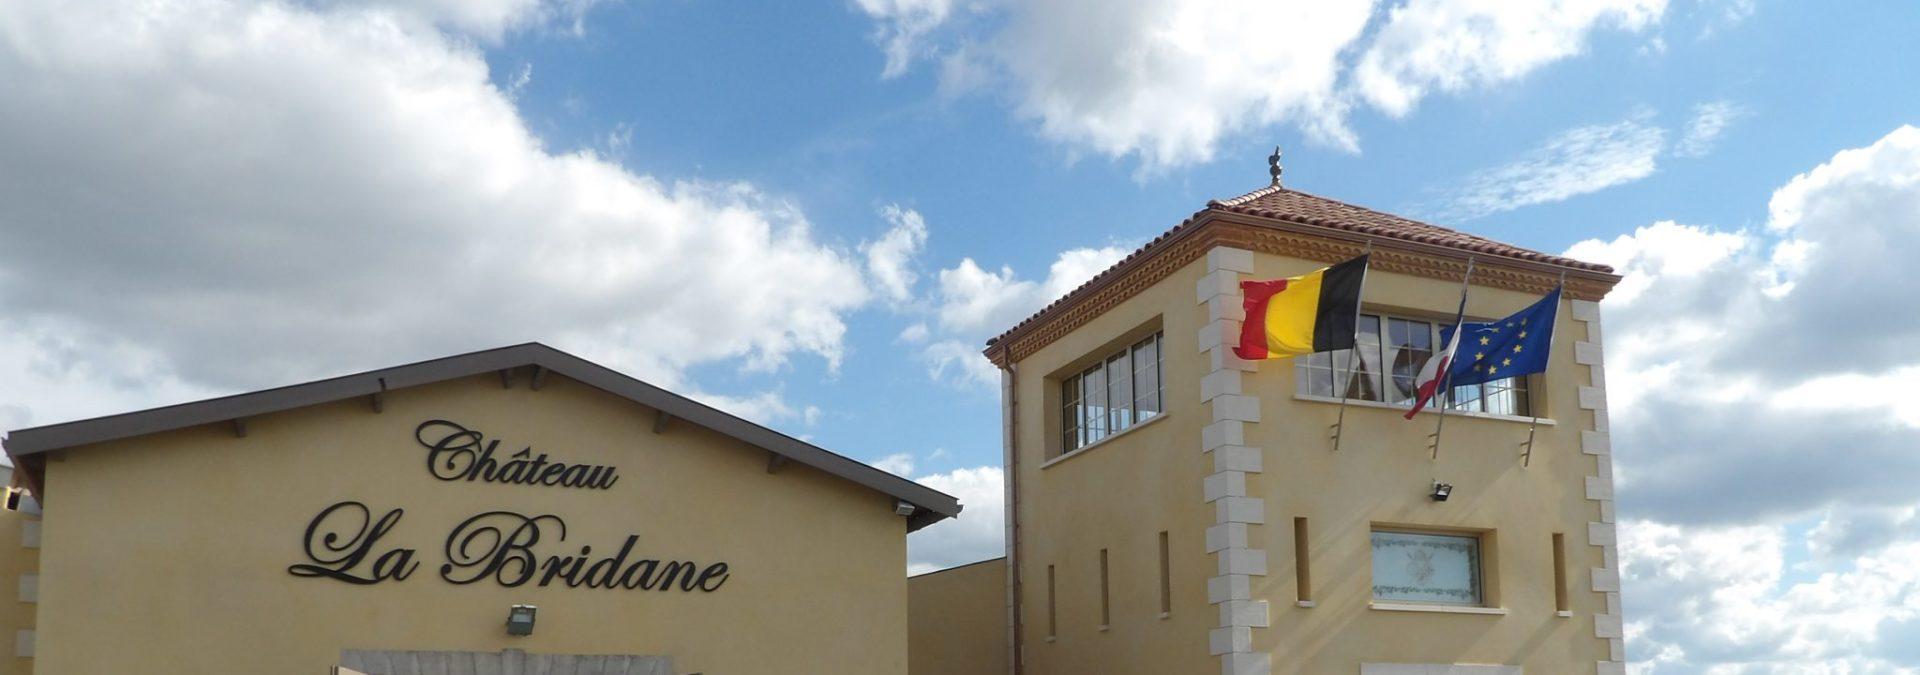 Château La Bridane